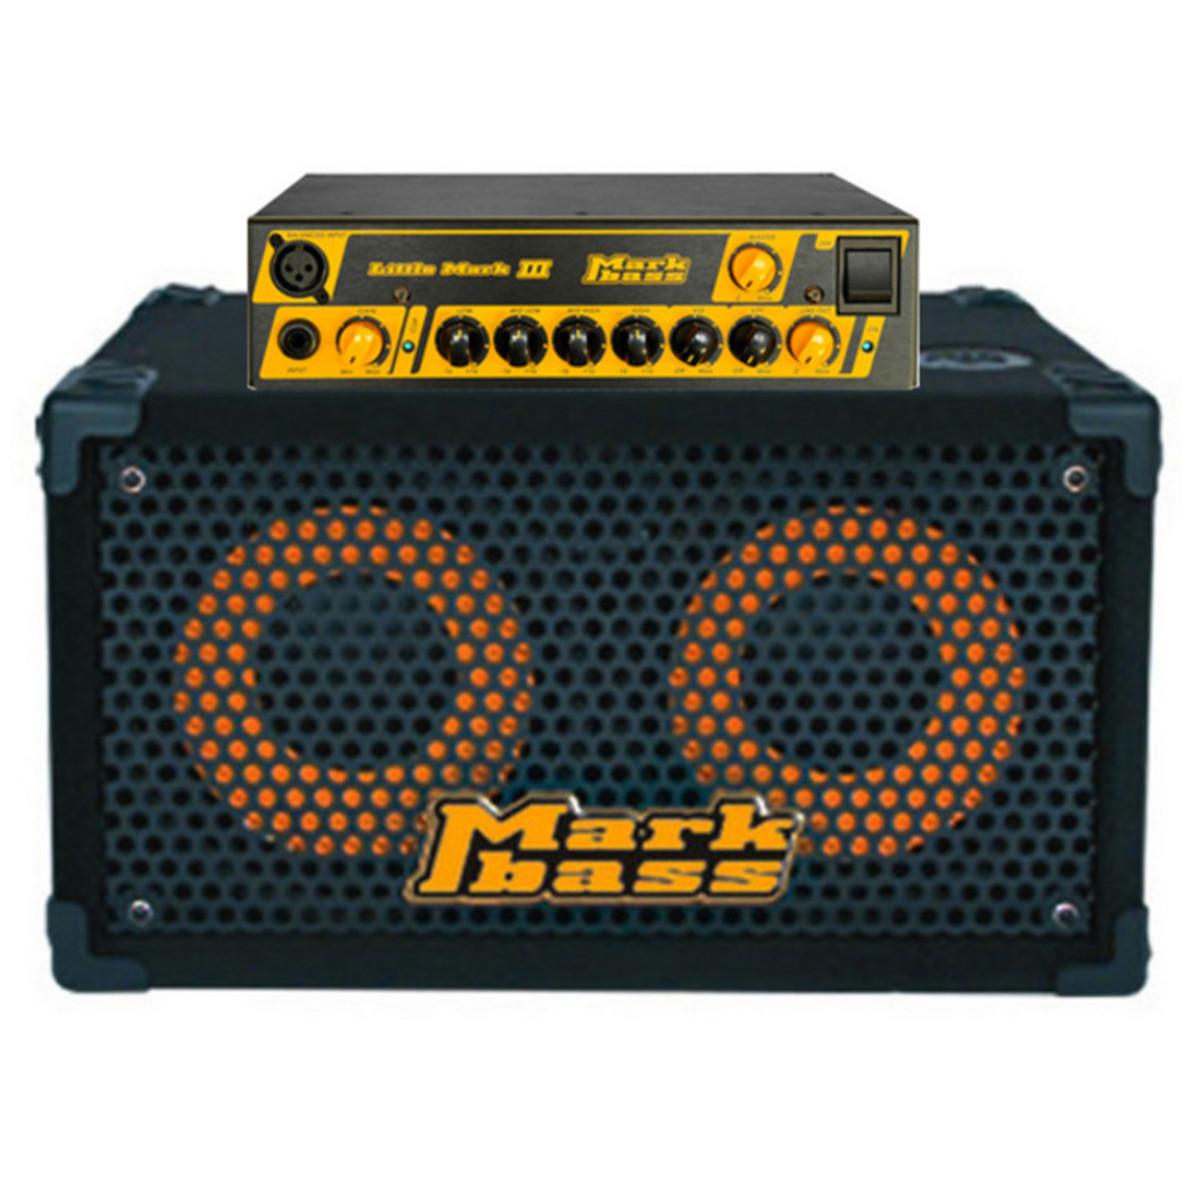 Mark Bass Amps : markbass little mark iii bass amp head with trv102p cabinet bundle at ~ Vivirlamusica.com Haus und Dekorationen